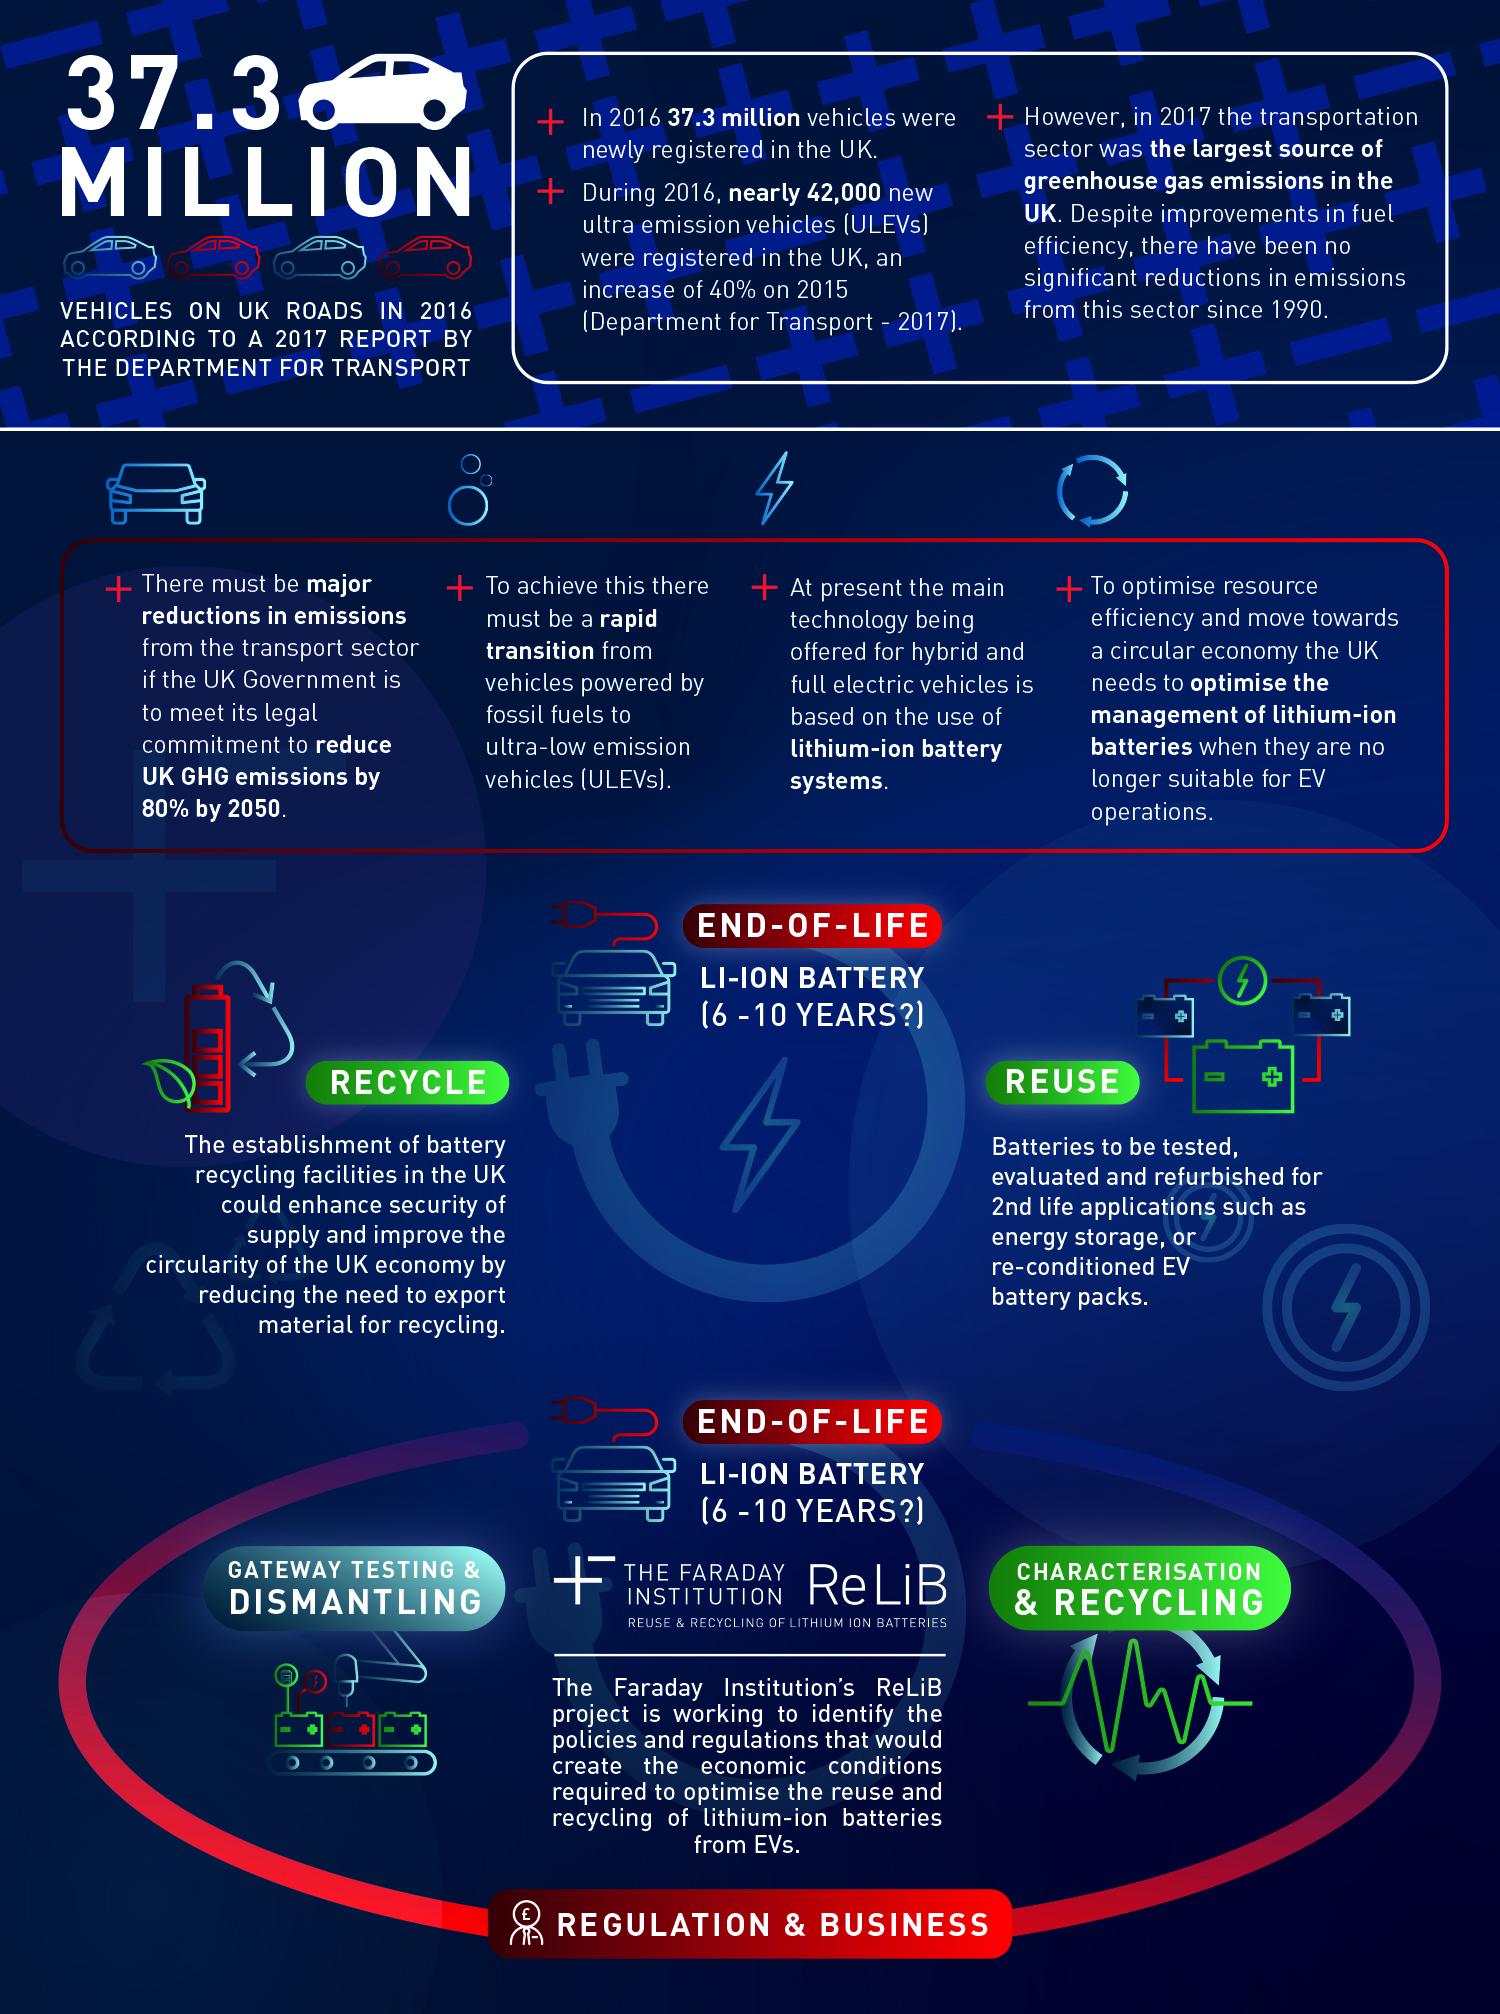 University-of-Birmingham-ReLIB_Project_Infographic_v6